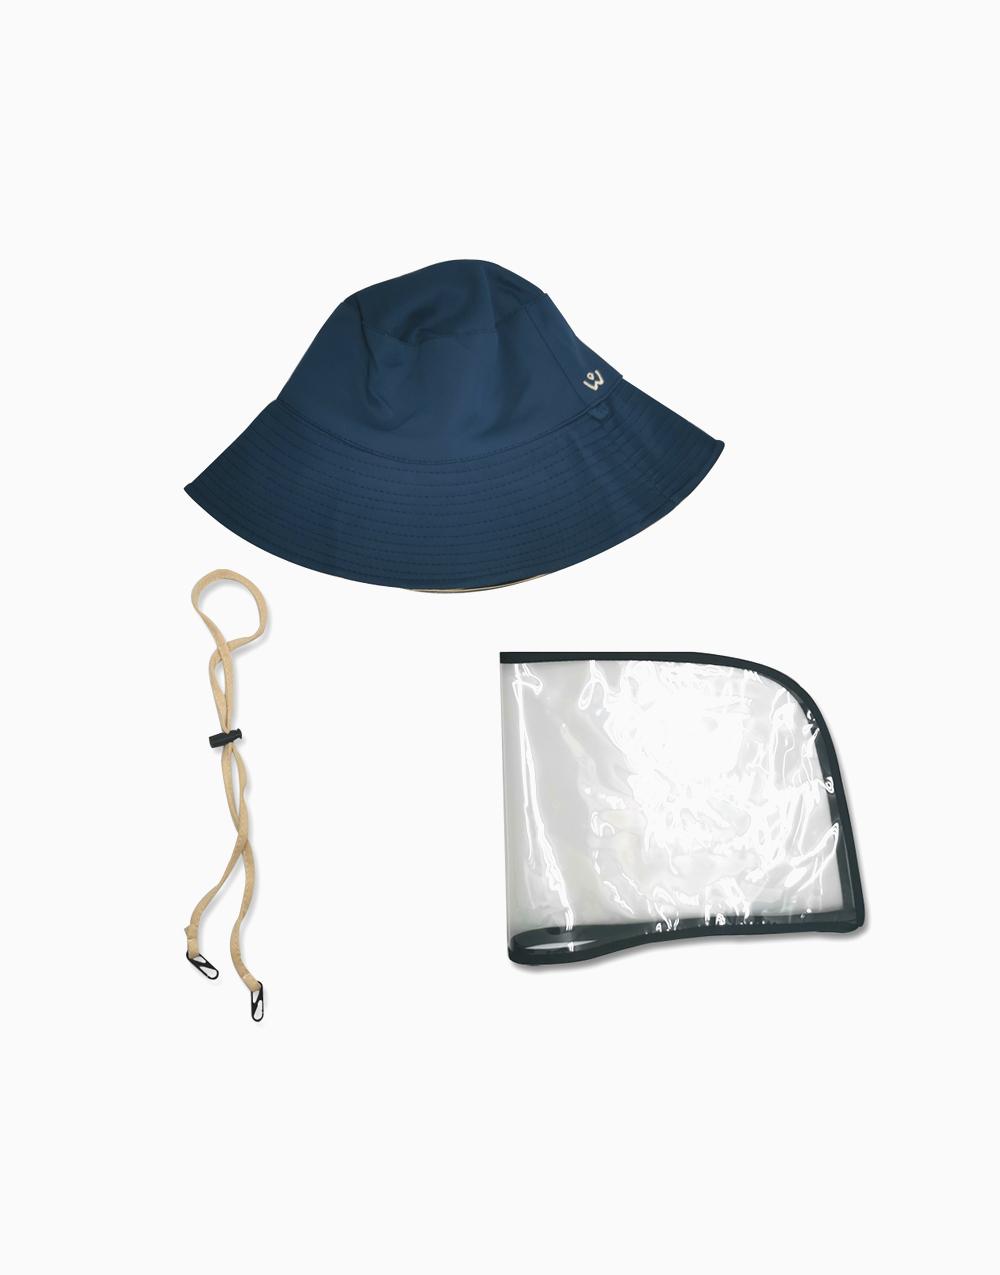 Reversible Bucket Hat by Wanderskye | Blue/Cream